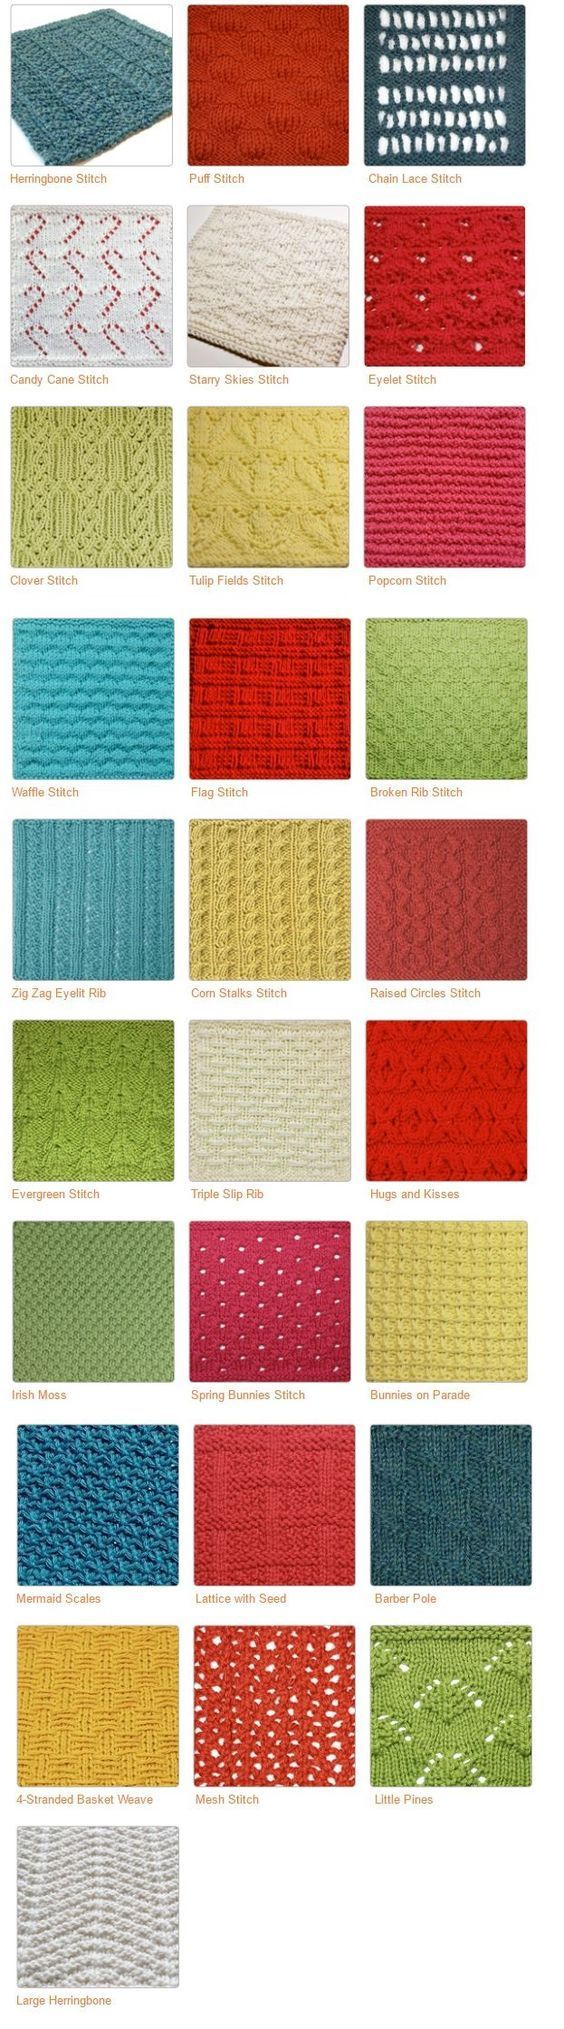 Loom Knit Stitches | Knitting and crochet | Pinterest | Stitch